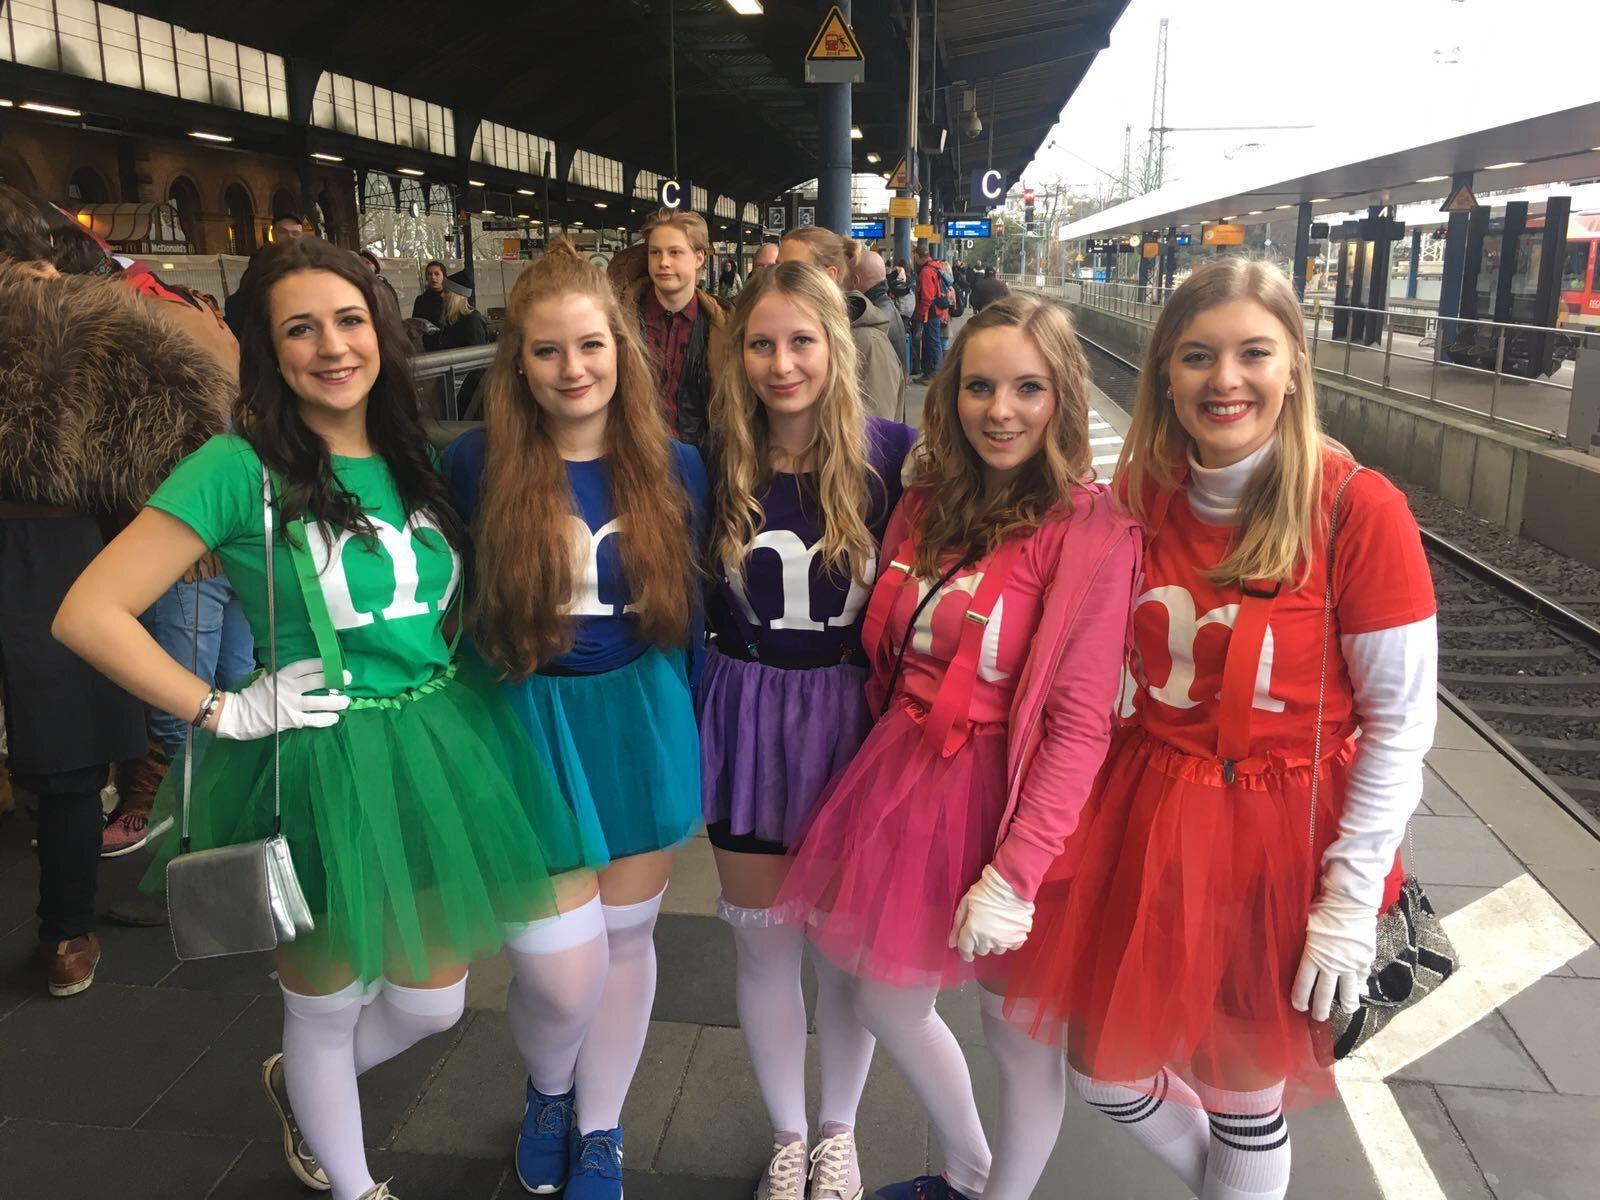 Rock n Roll Kinderkostüm in 4 Farben NEU Mädchen Karneval Fasching Verkleidung